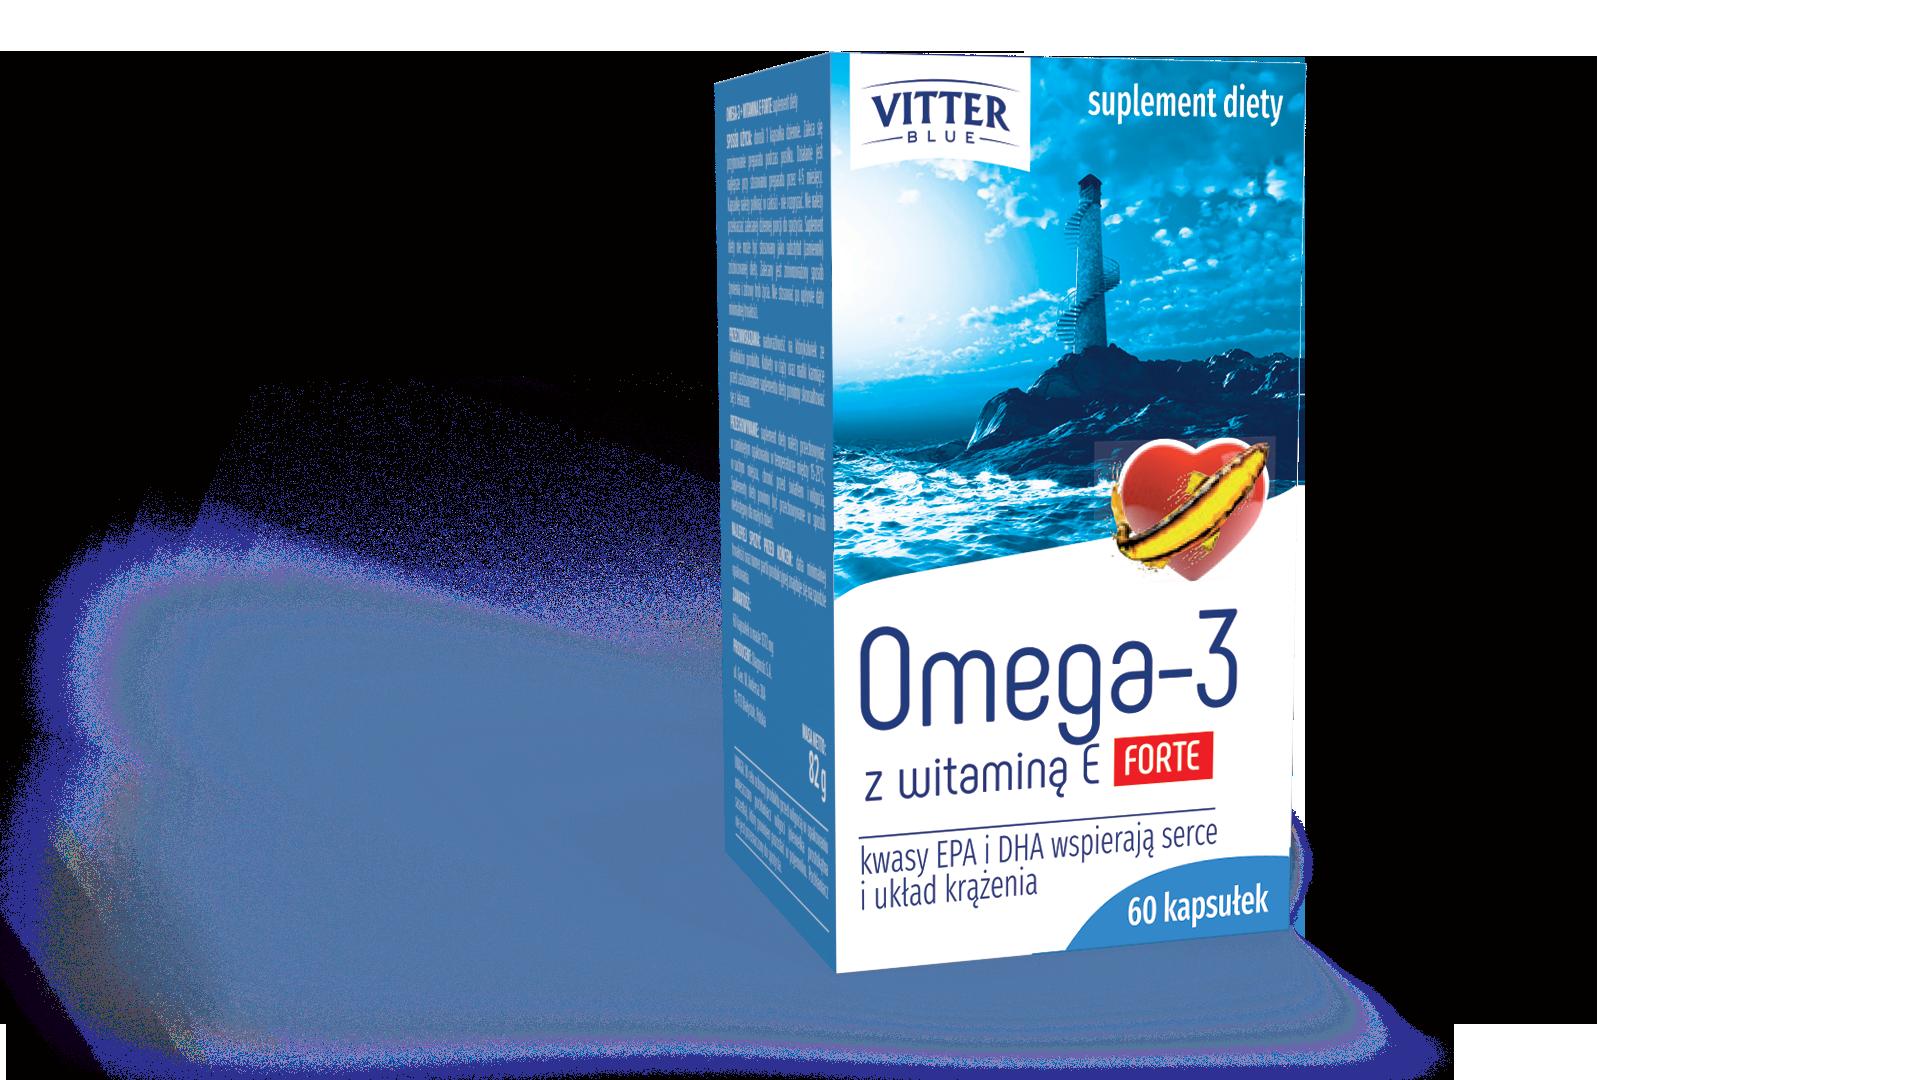 Suplement Diety Kapsułki- Omega 3 z witaminą E FORTE - rybi olej